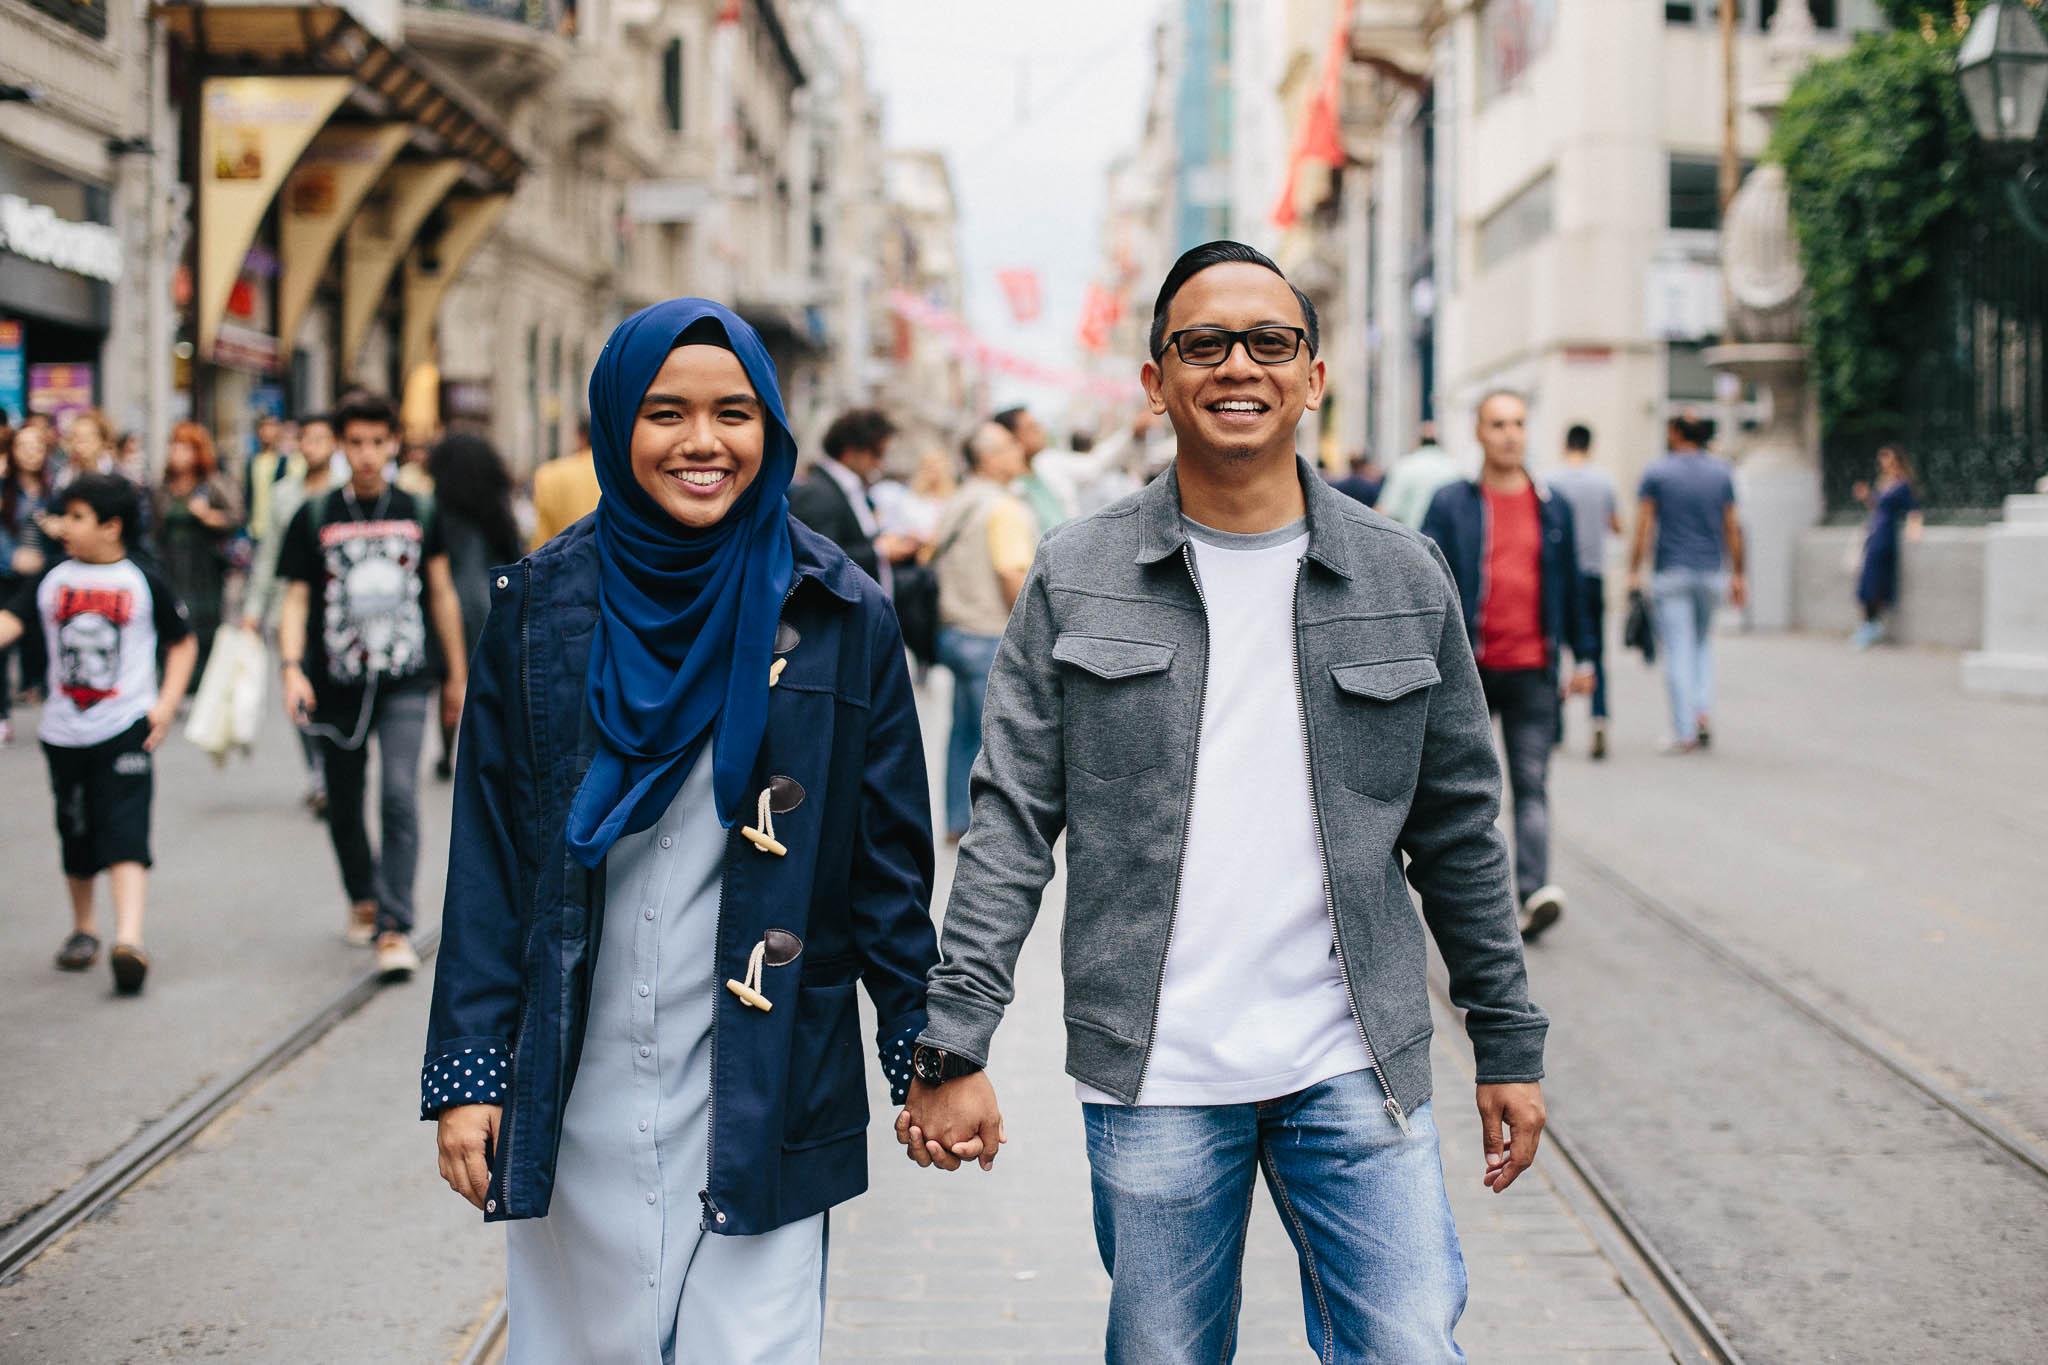 singapore-wedding-photographer-dzul-isma-istanbul-29.jpg